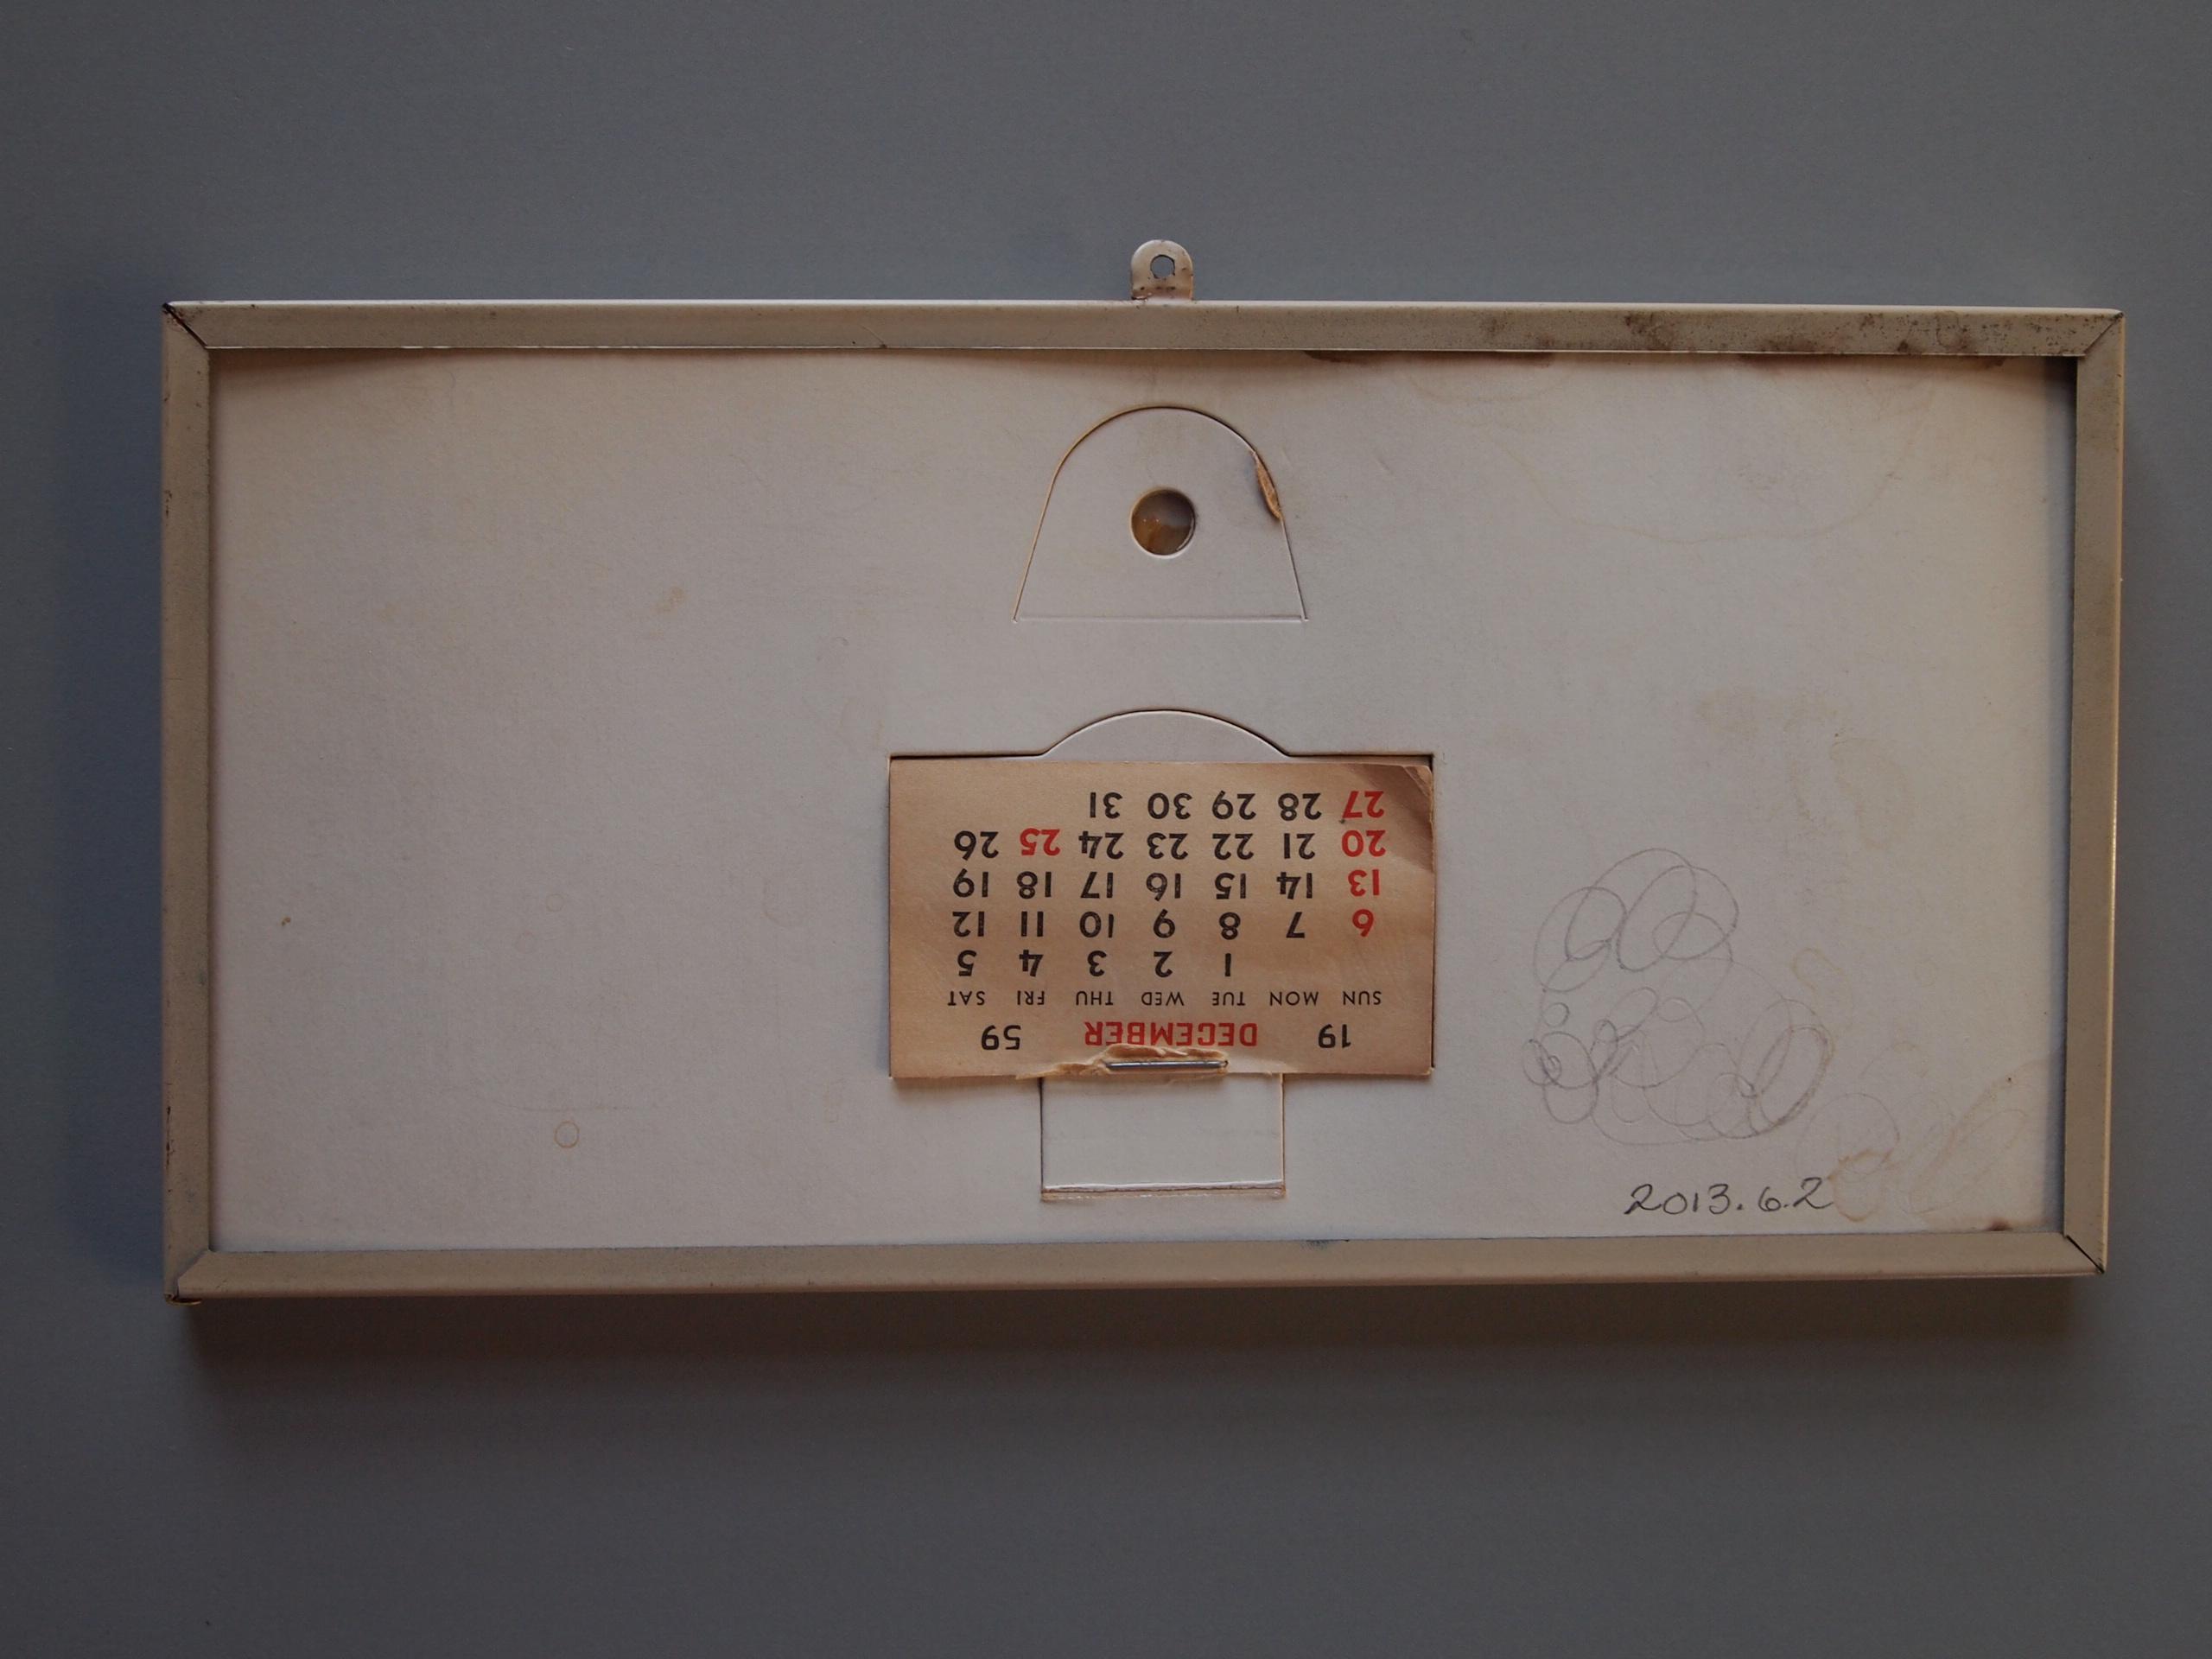 Framed Novelty (back) from Frank Kammermeyer, Bulk Agent, of Pierz, Minnesota, 1959. Morrison County Historical Society collections, #2013.6.2.